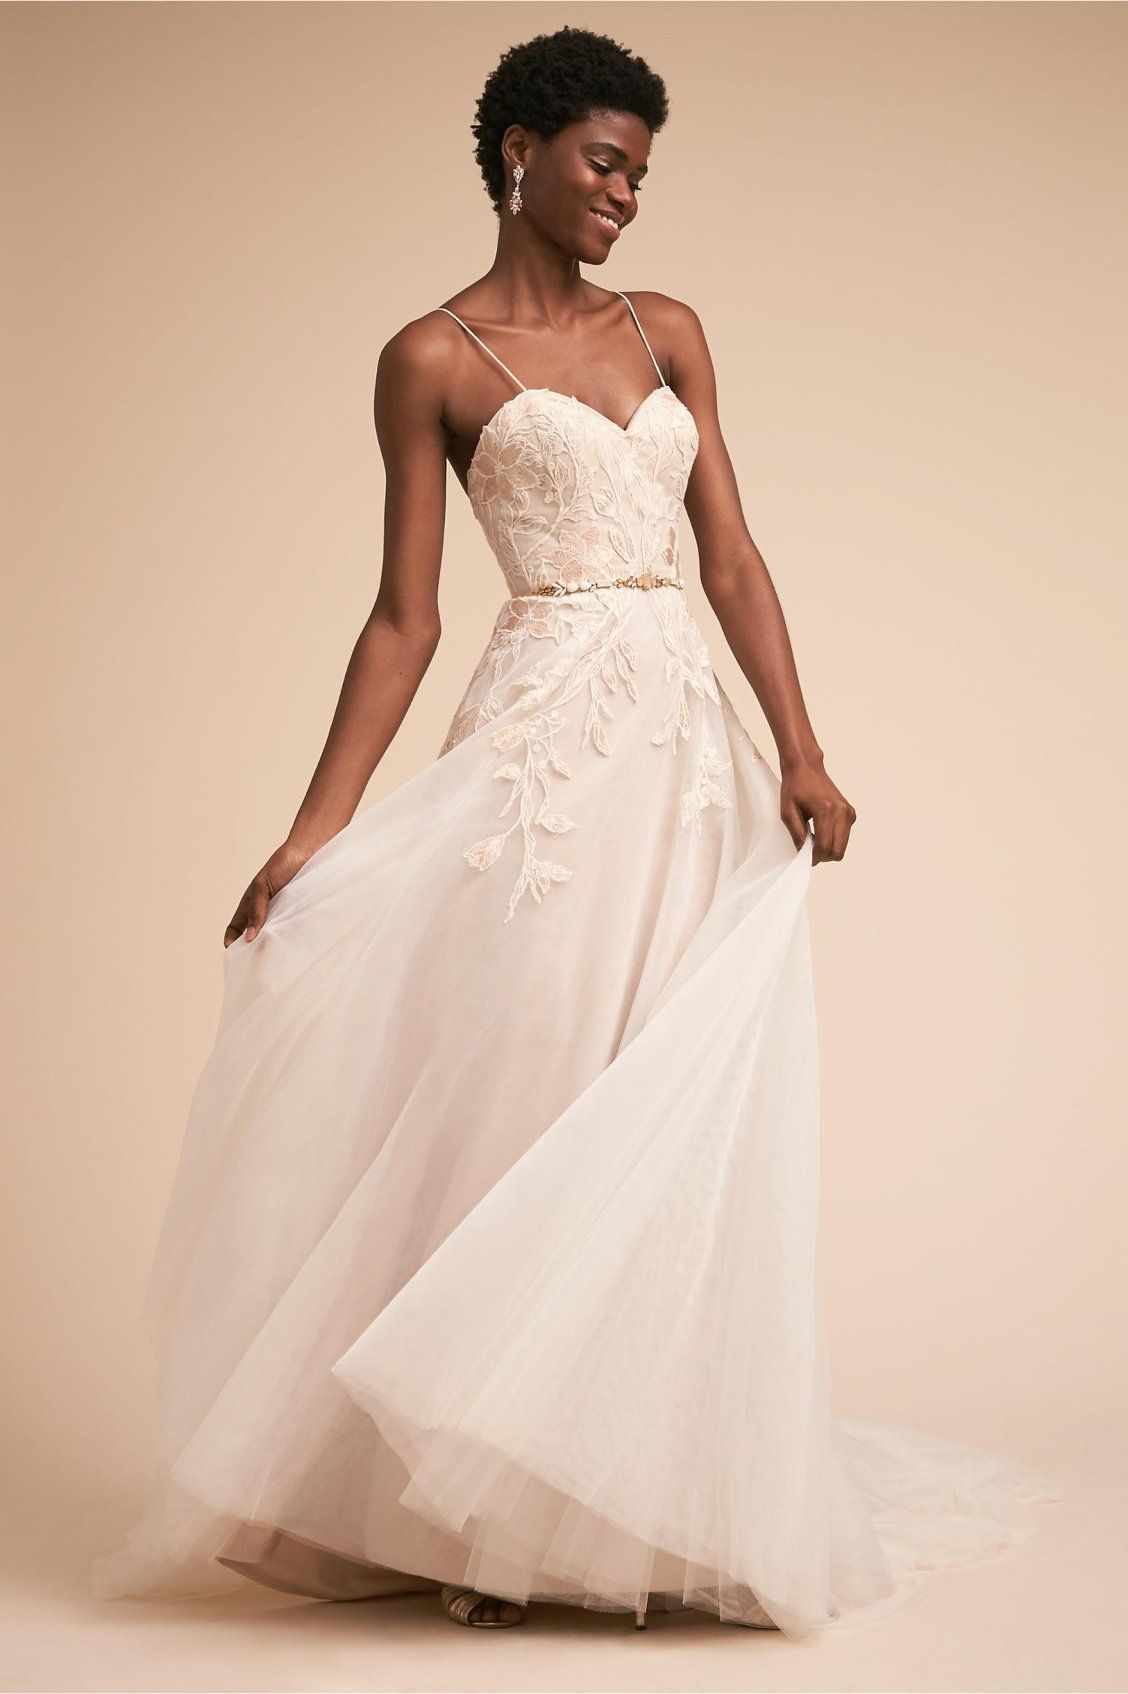 Guinevere Gown From Bhldn Bhldn Wedding Dress Gorgeous Wedding